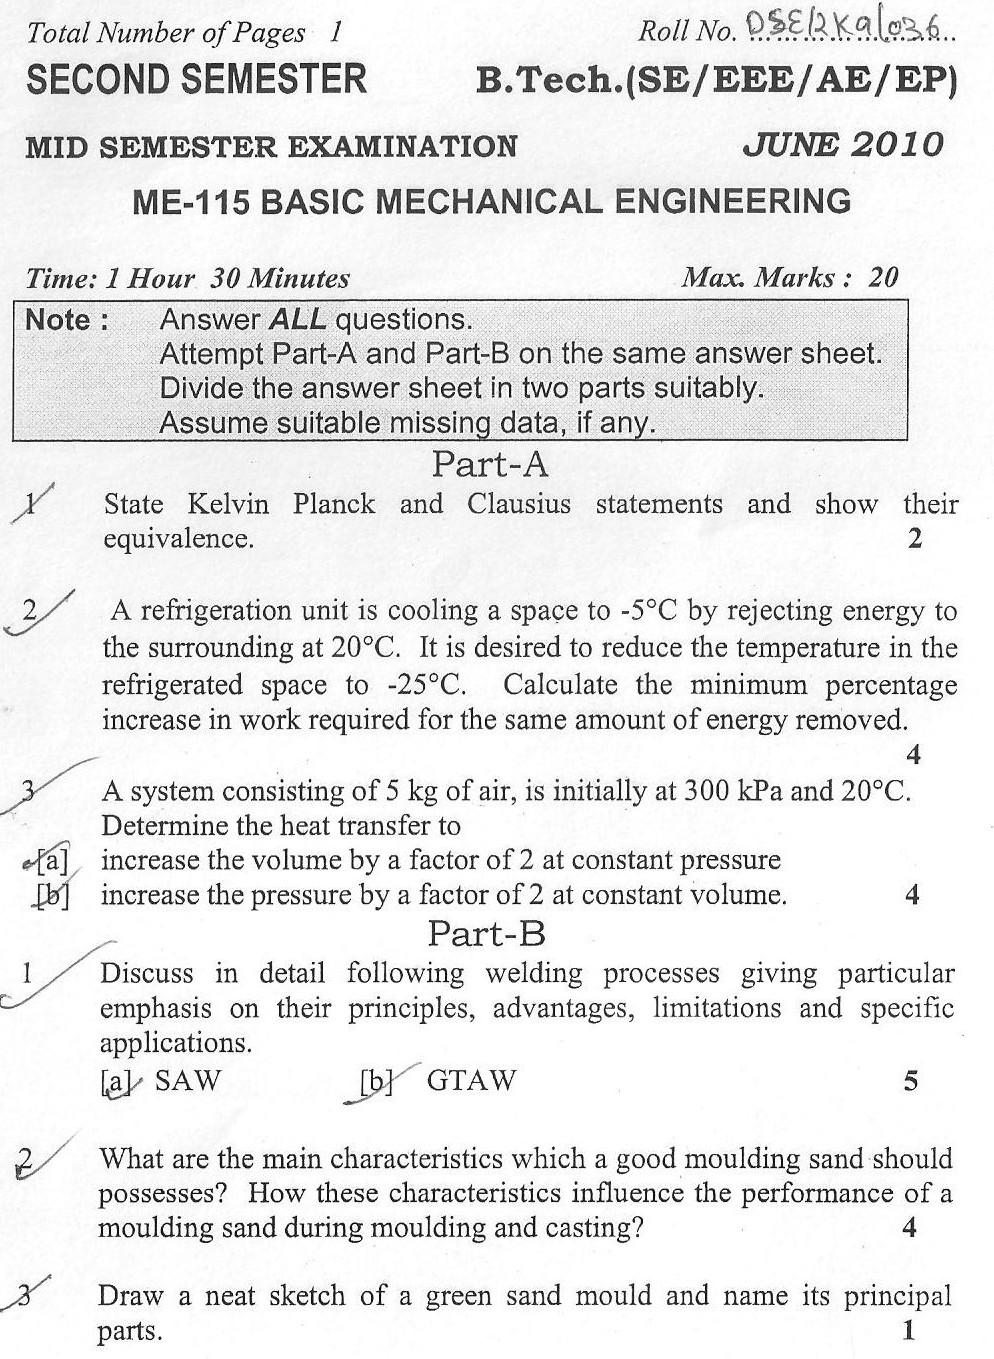 DTU Question Papers 2010 – 2 Semester - Mid Sem - ME-115